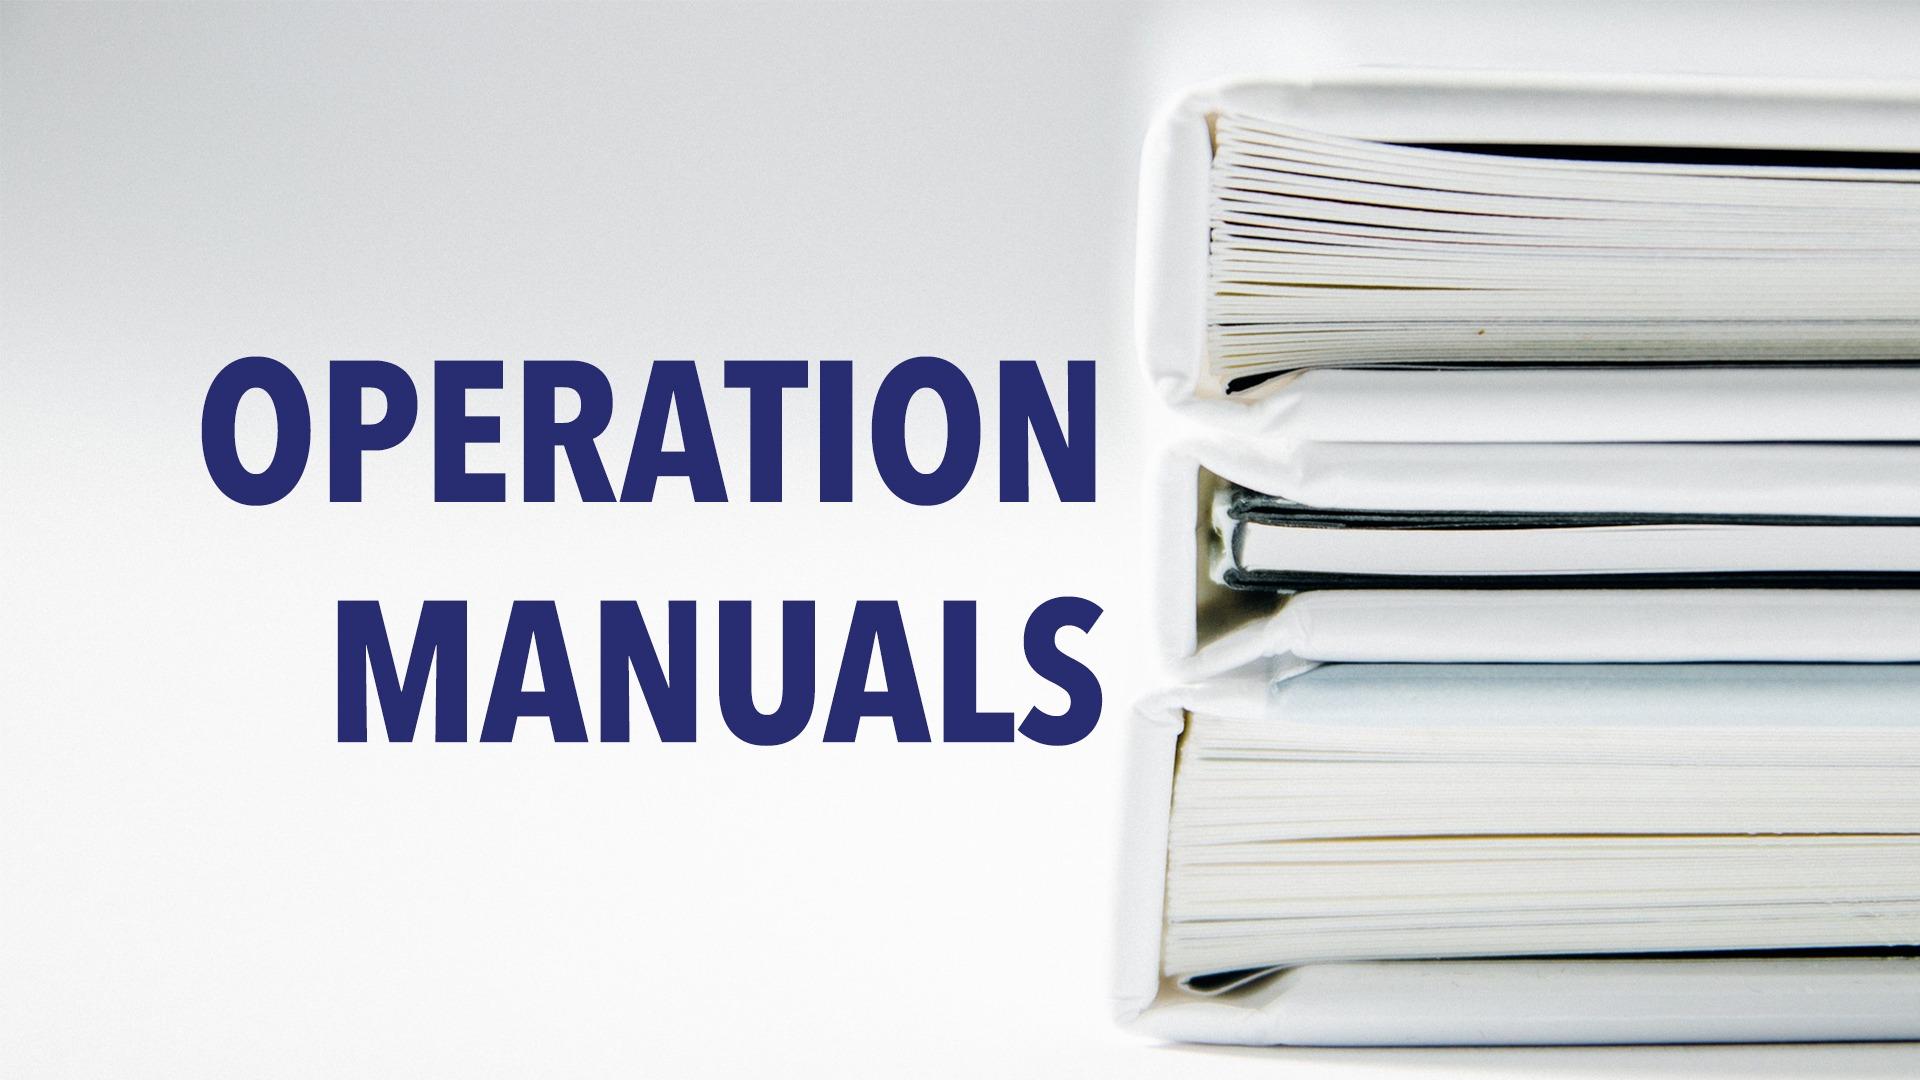 operation manuals